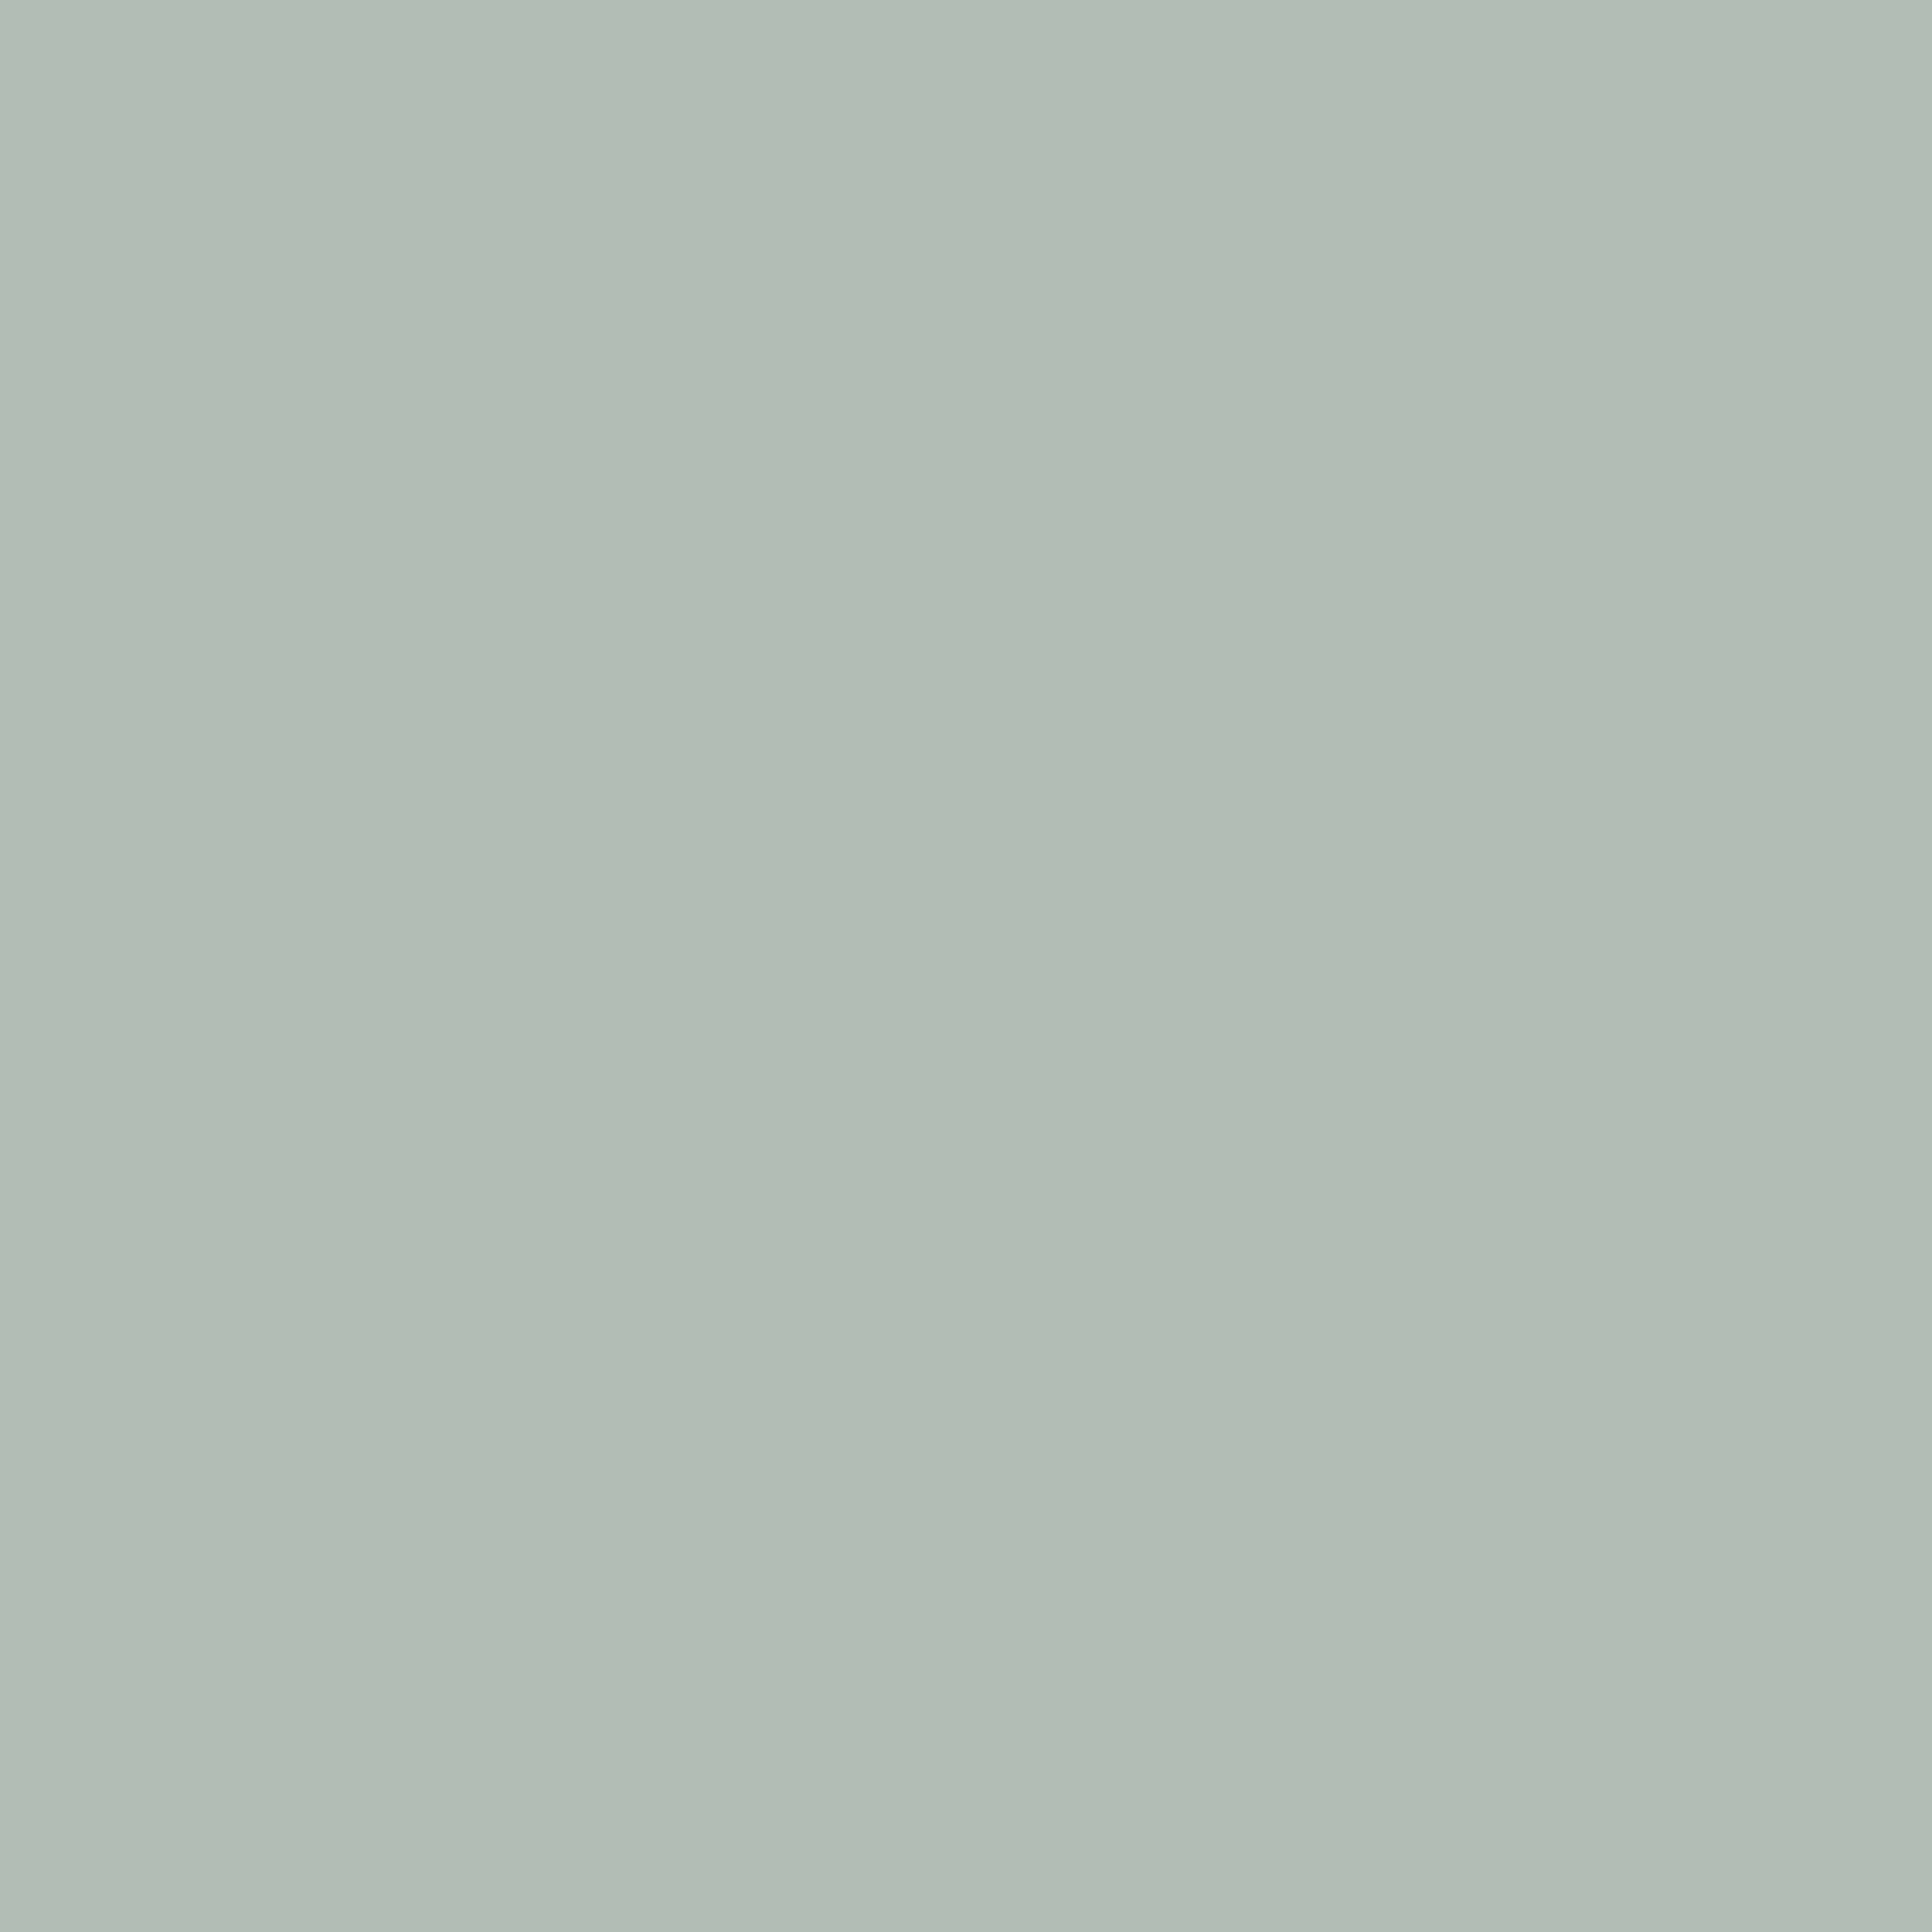 2732x2732 Ash Grey Solid Color Background